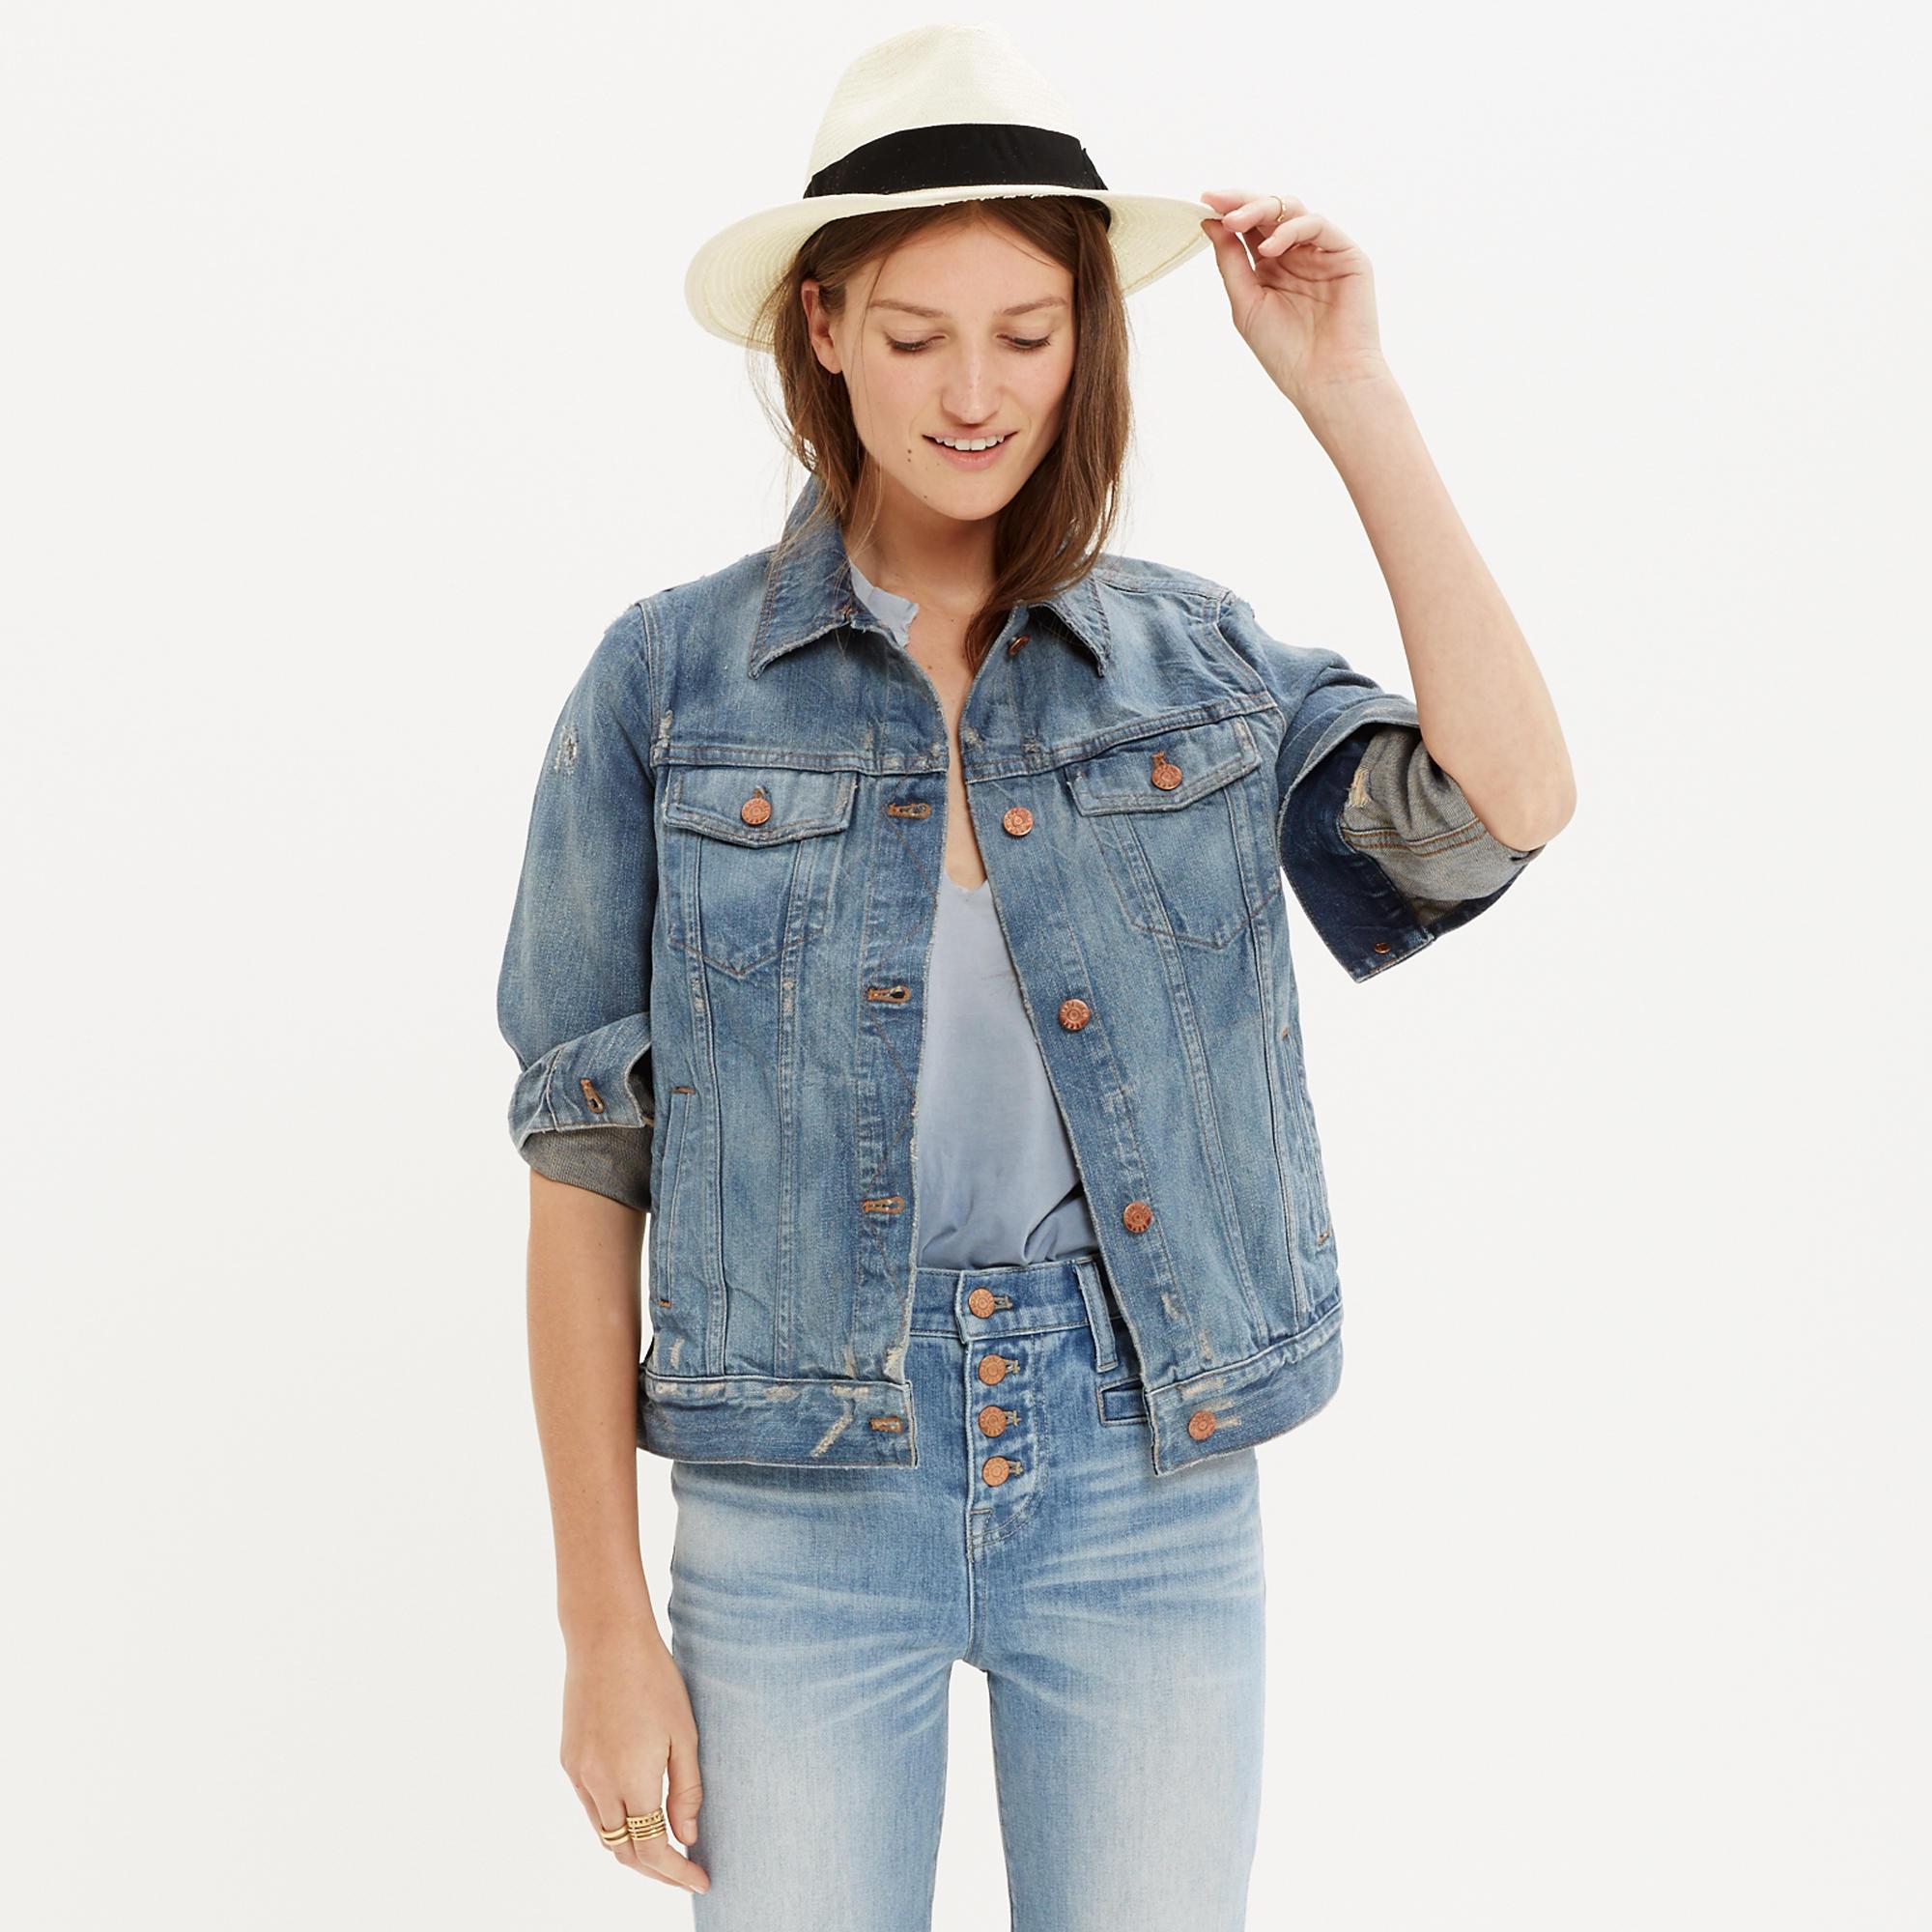 Ways to style Jean Jackets